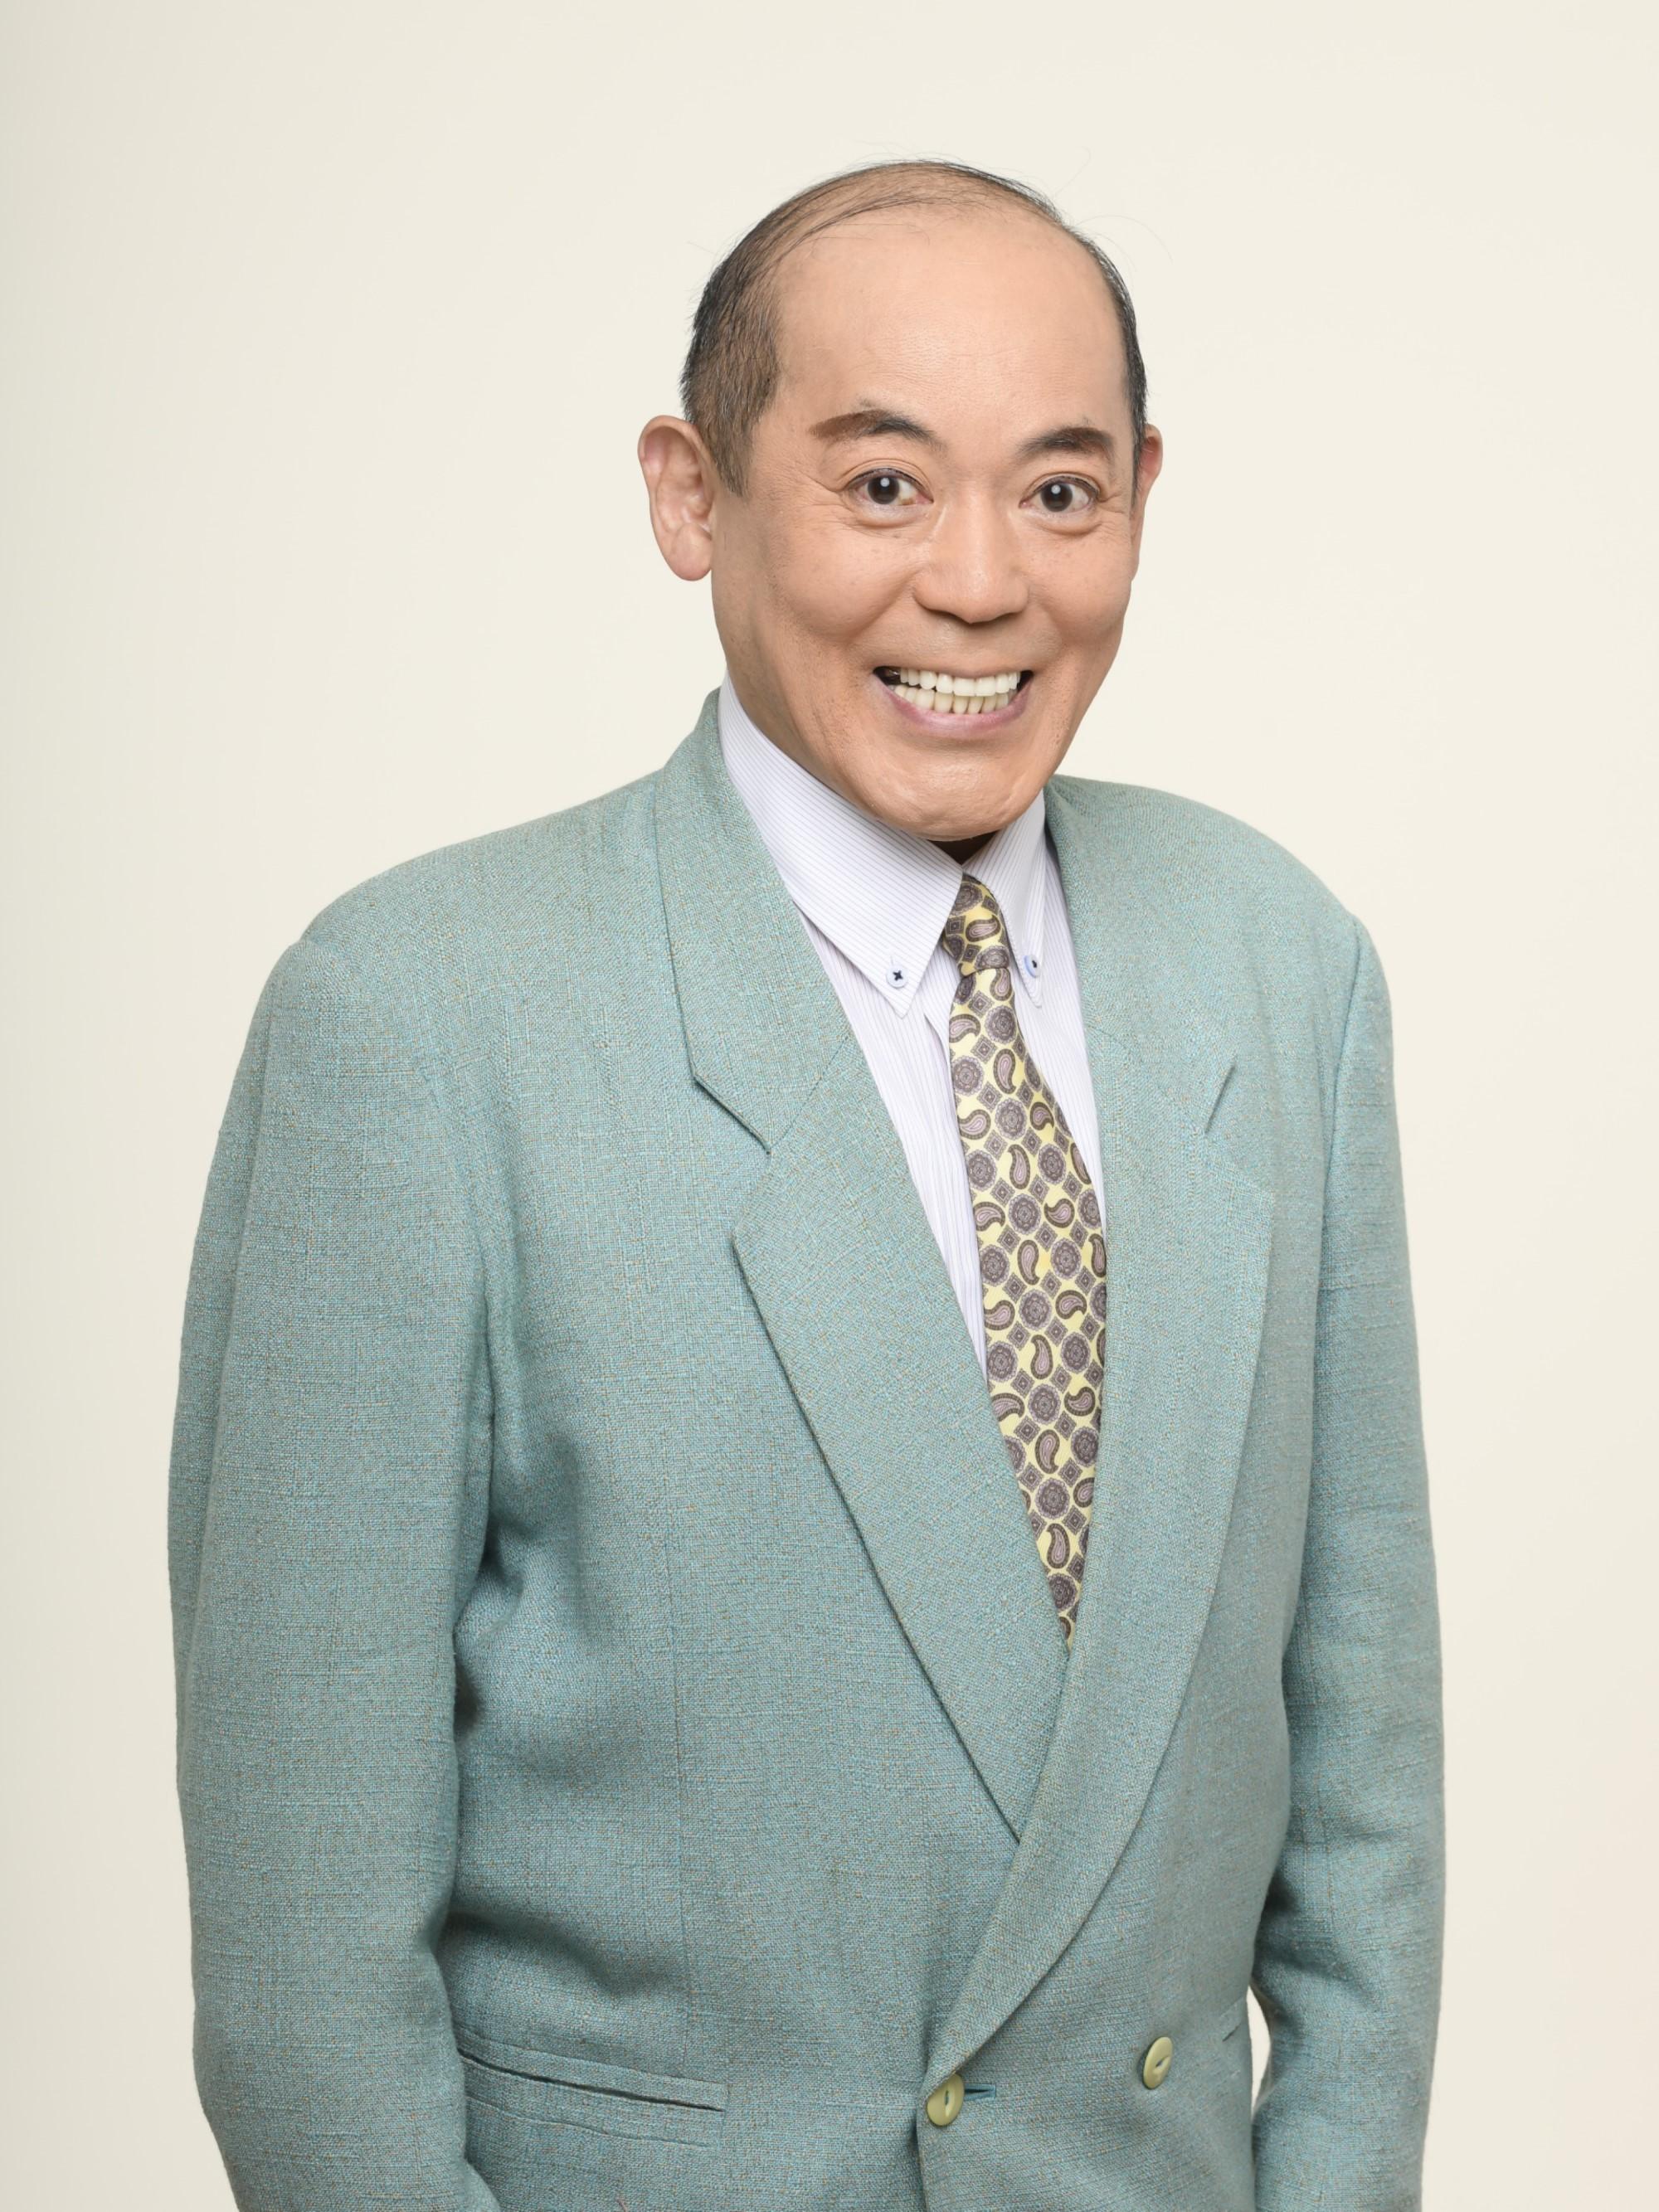 渋谷 天 笑 渋谷天笑 (2代目) - Wikipedia